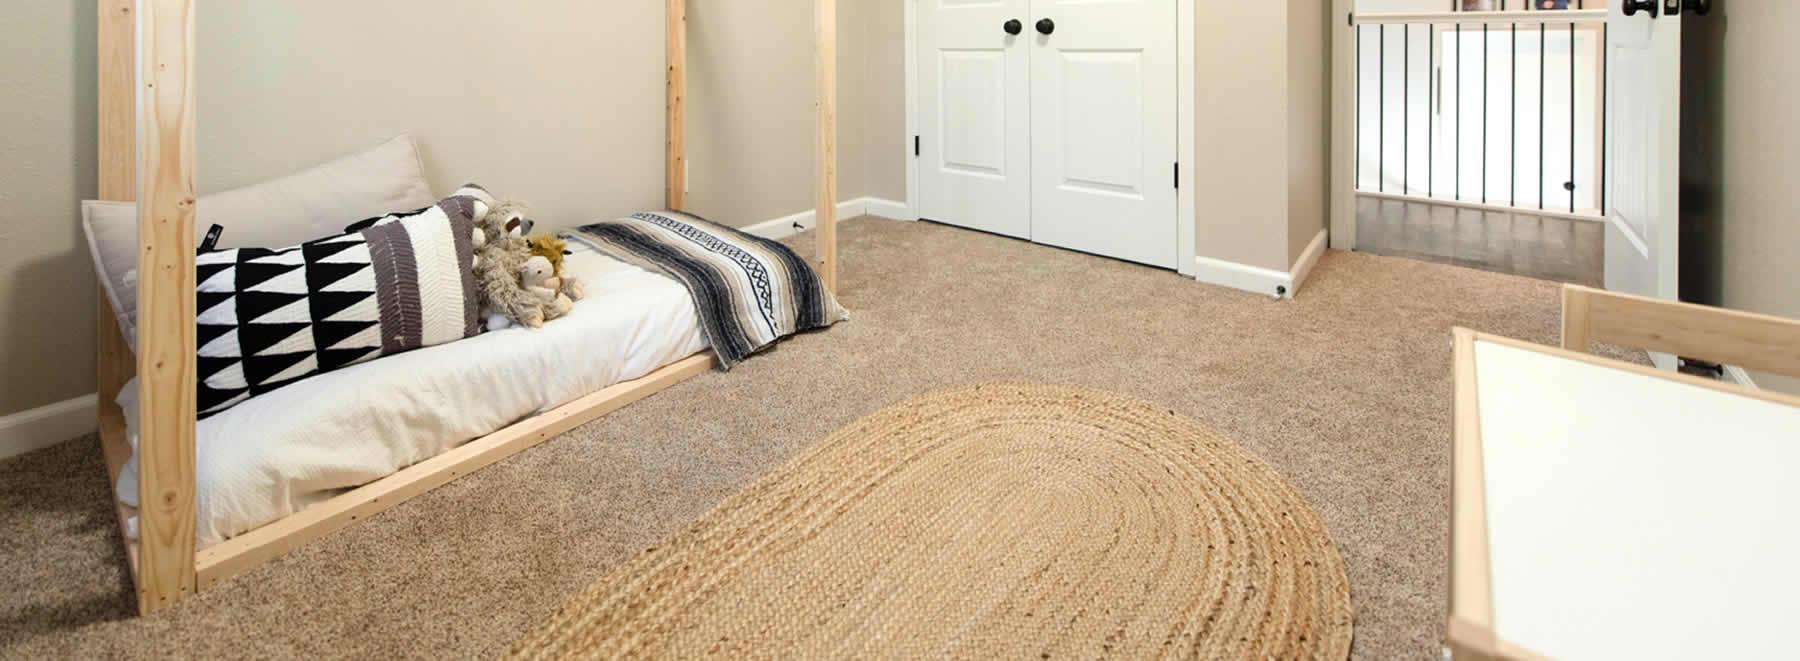 Large supply of flooring options